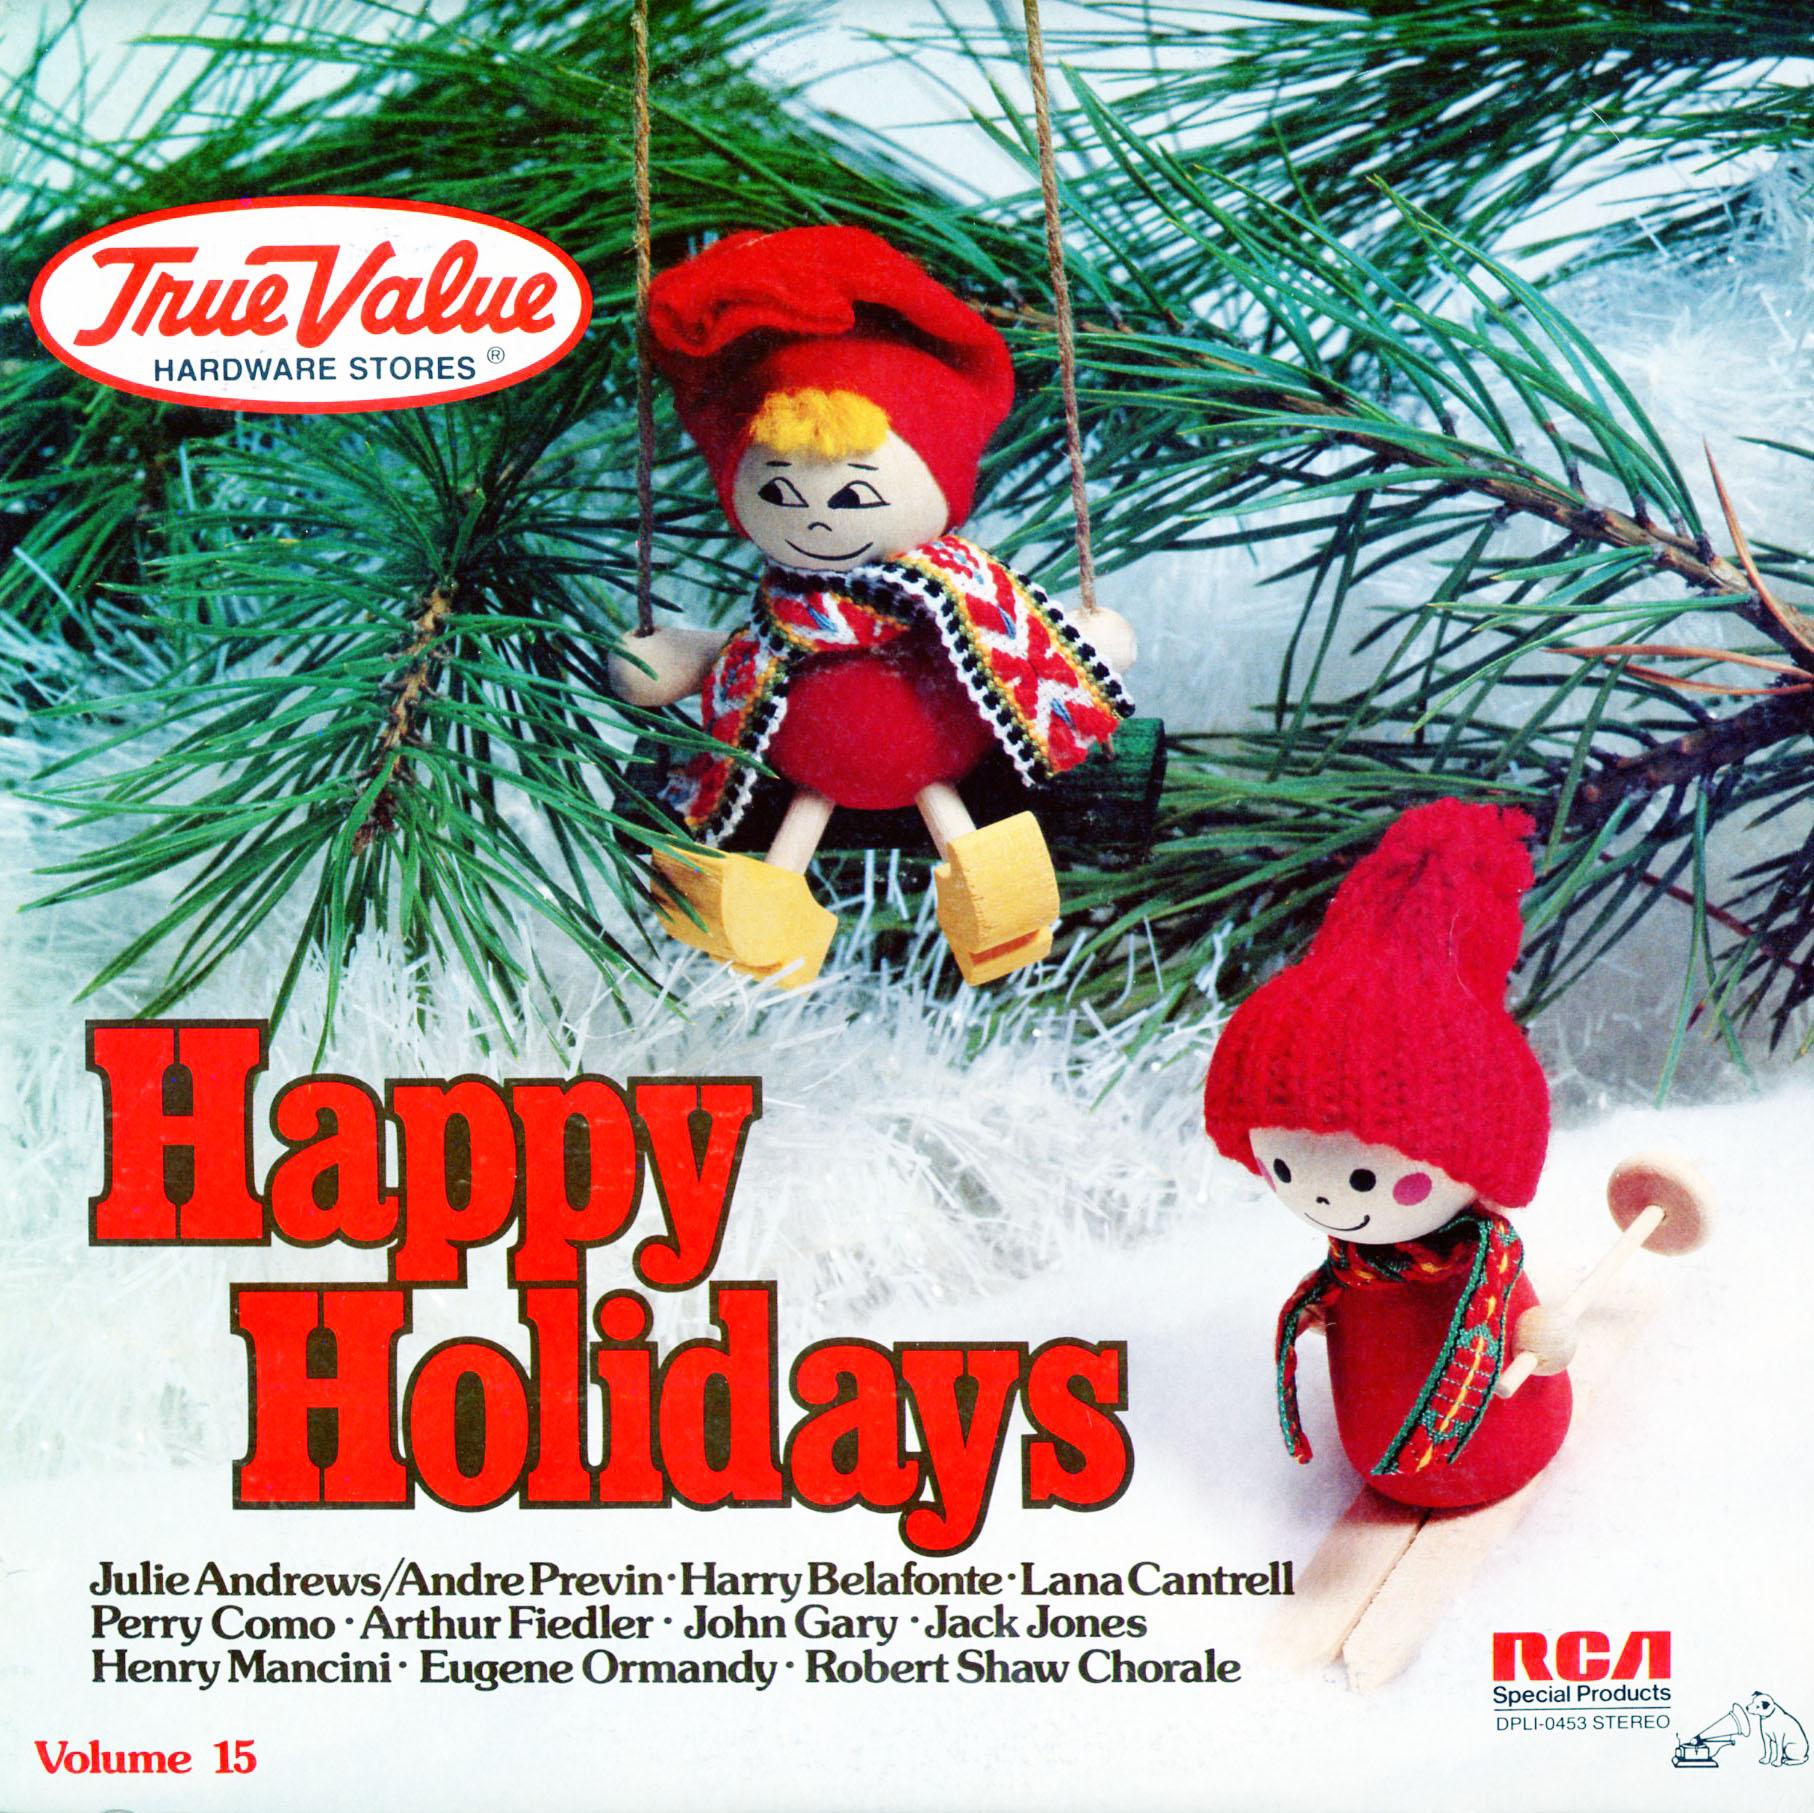 True Value Happy Holidays Volume 15 (dpl10453